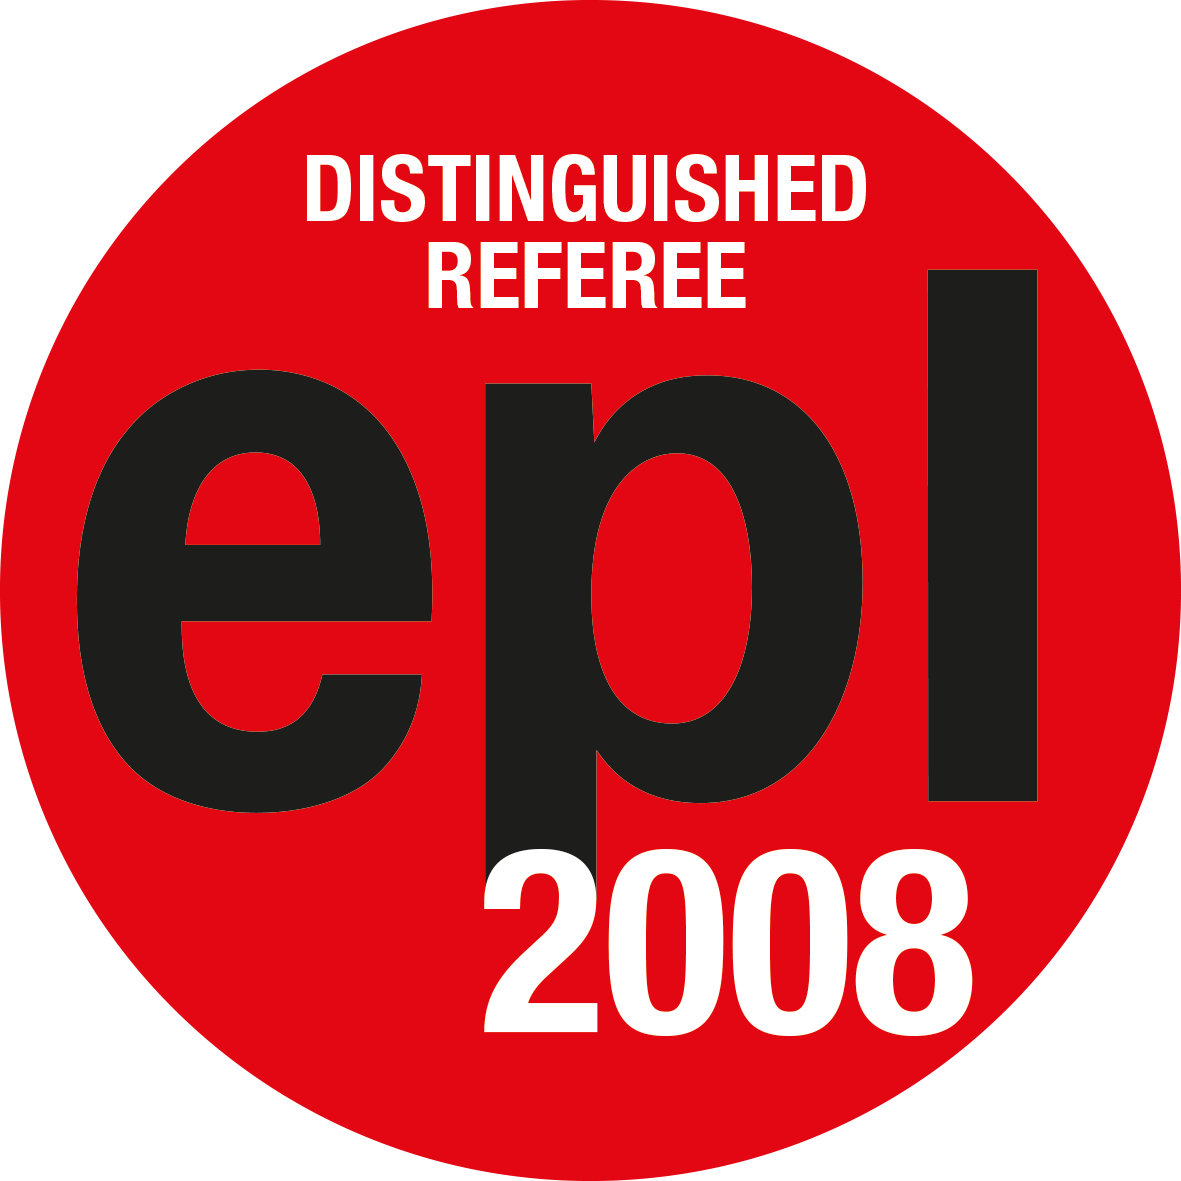 EPL Distinguished Referees 2008